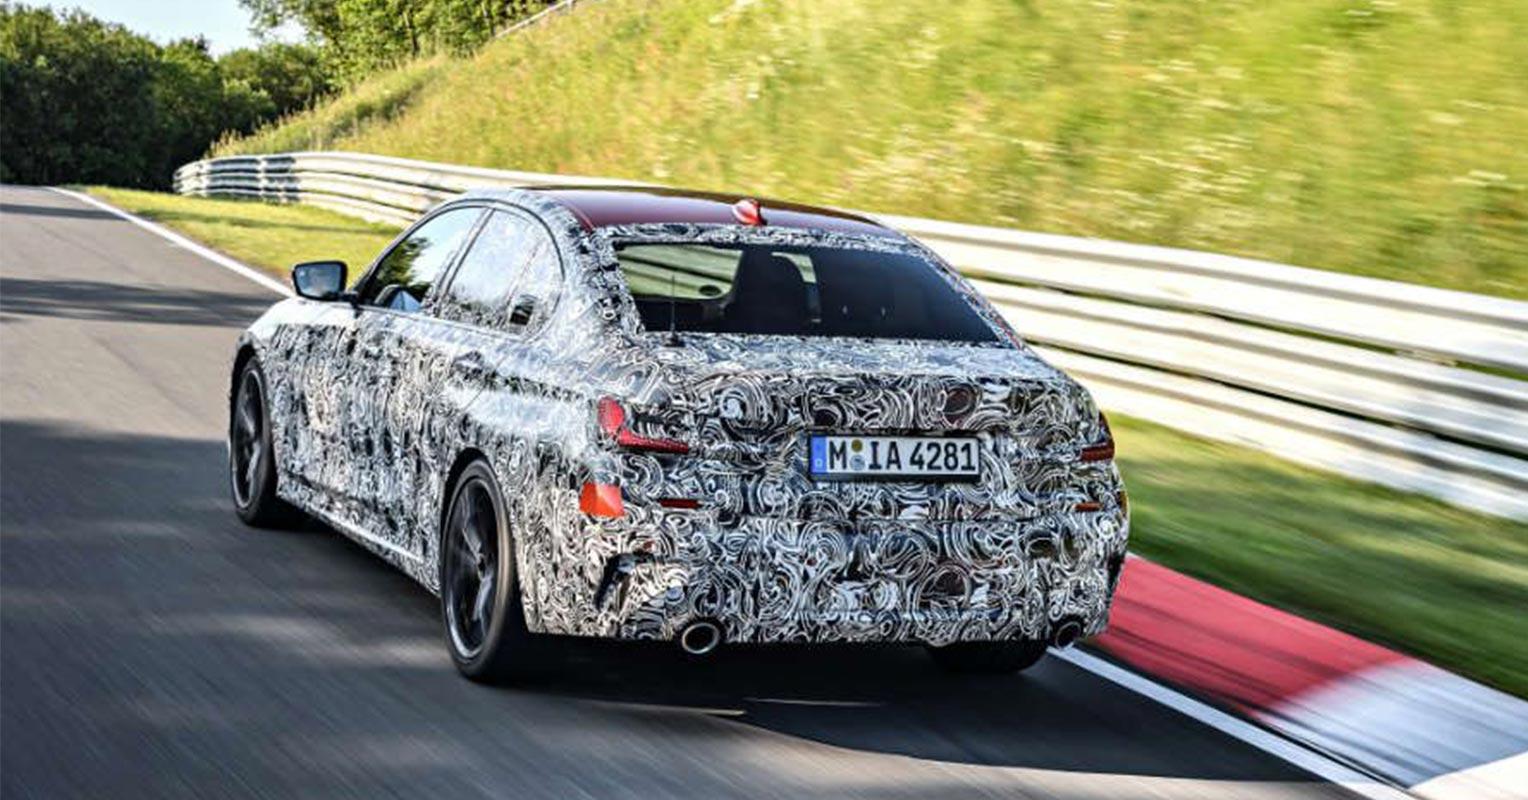 Trasera del BMW Serie 3 2019 camuflado